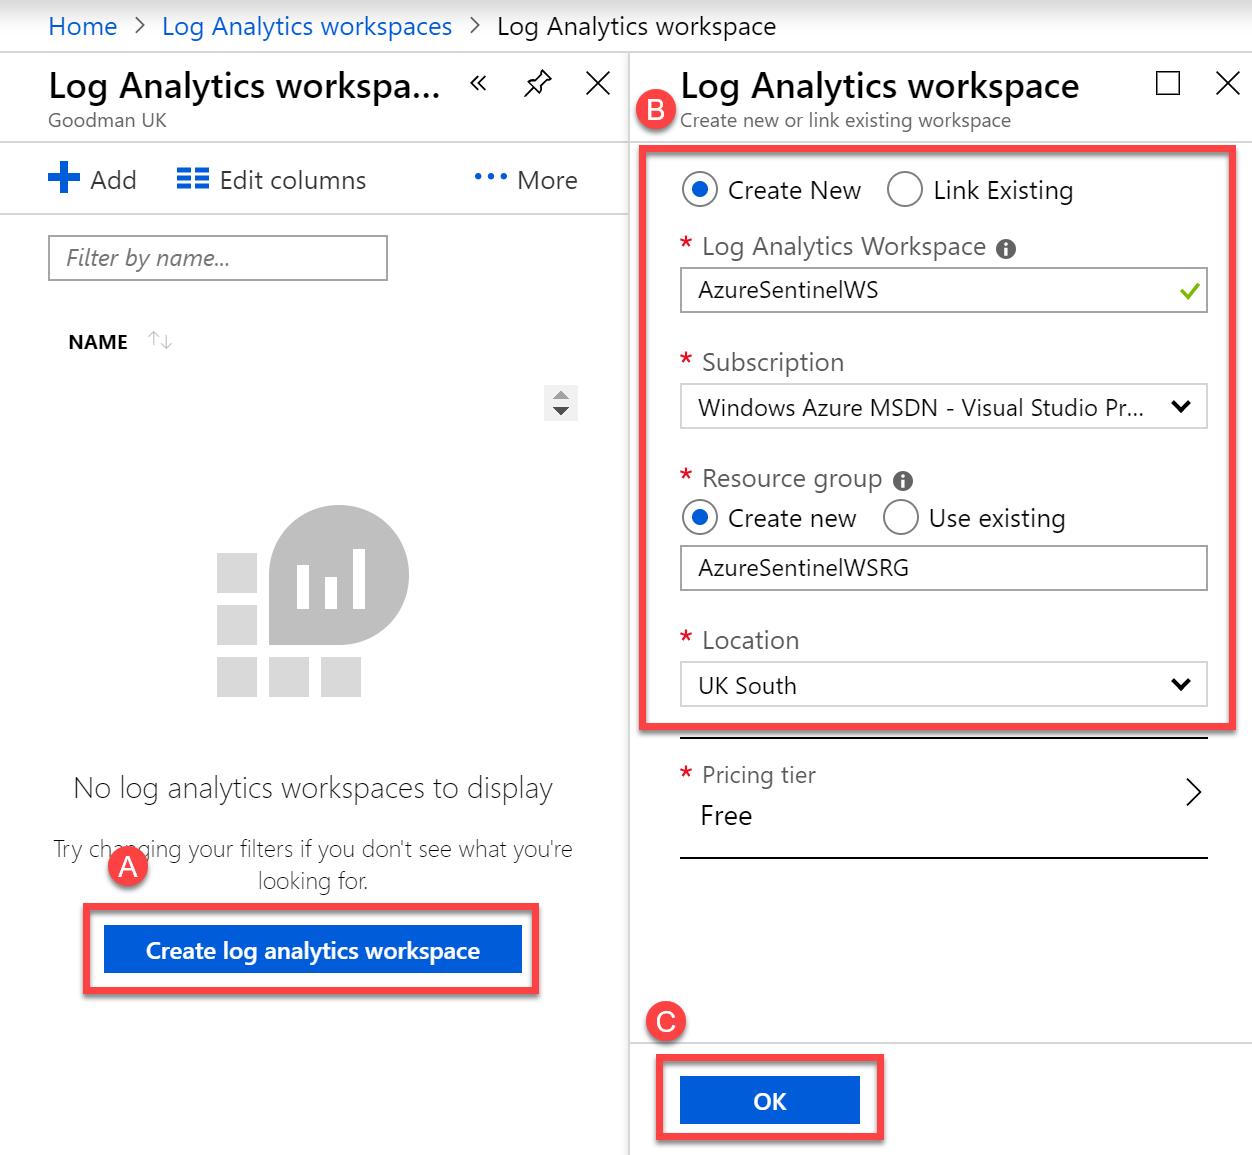 Create a new Log Analytics workspace